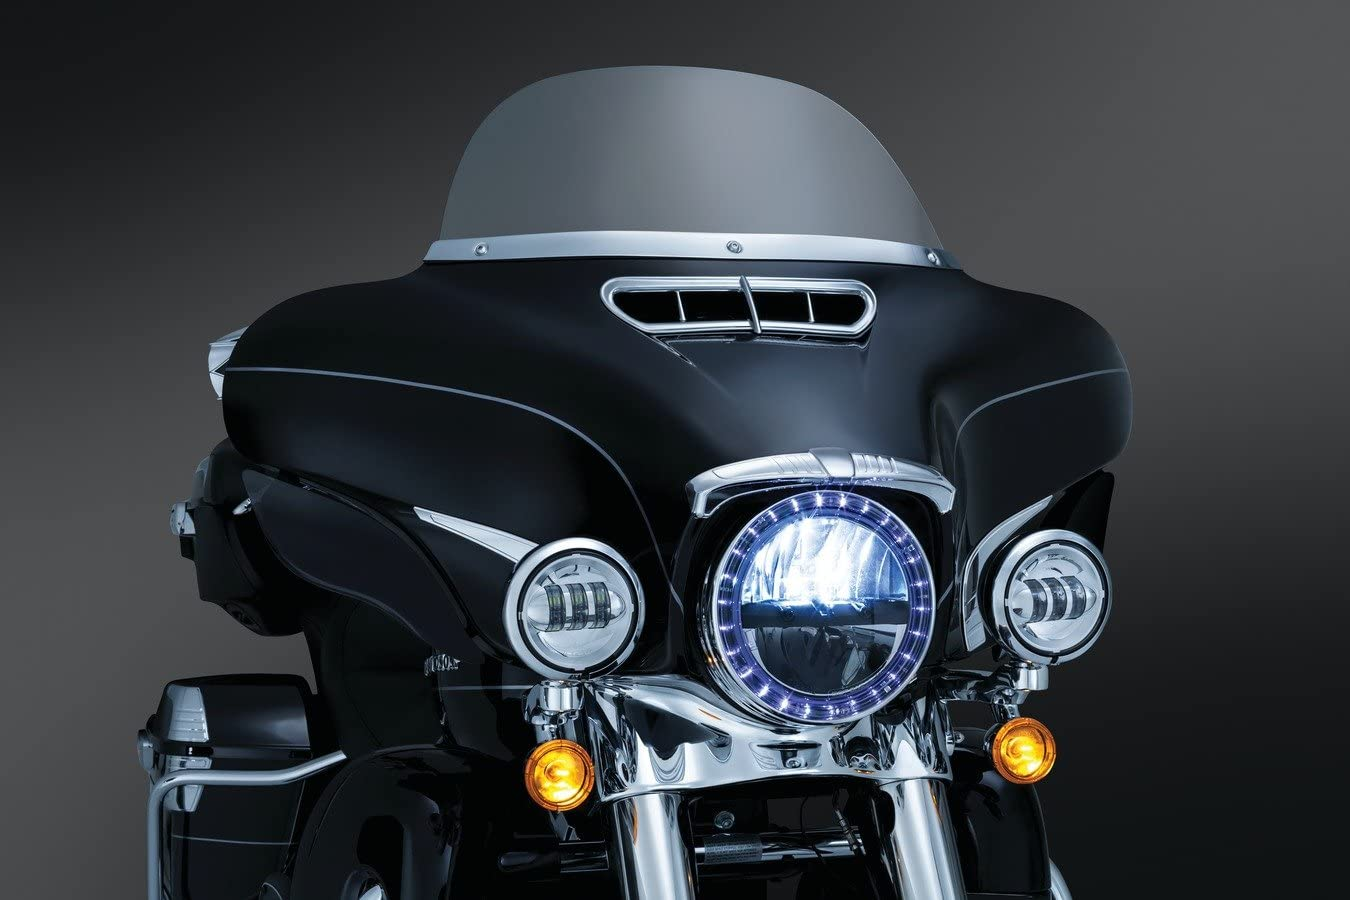 Trust Kuryakyn 7748 LED Halo Spotlight Rings Surprise price 4-1 for Harley-Davidson 2